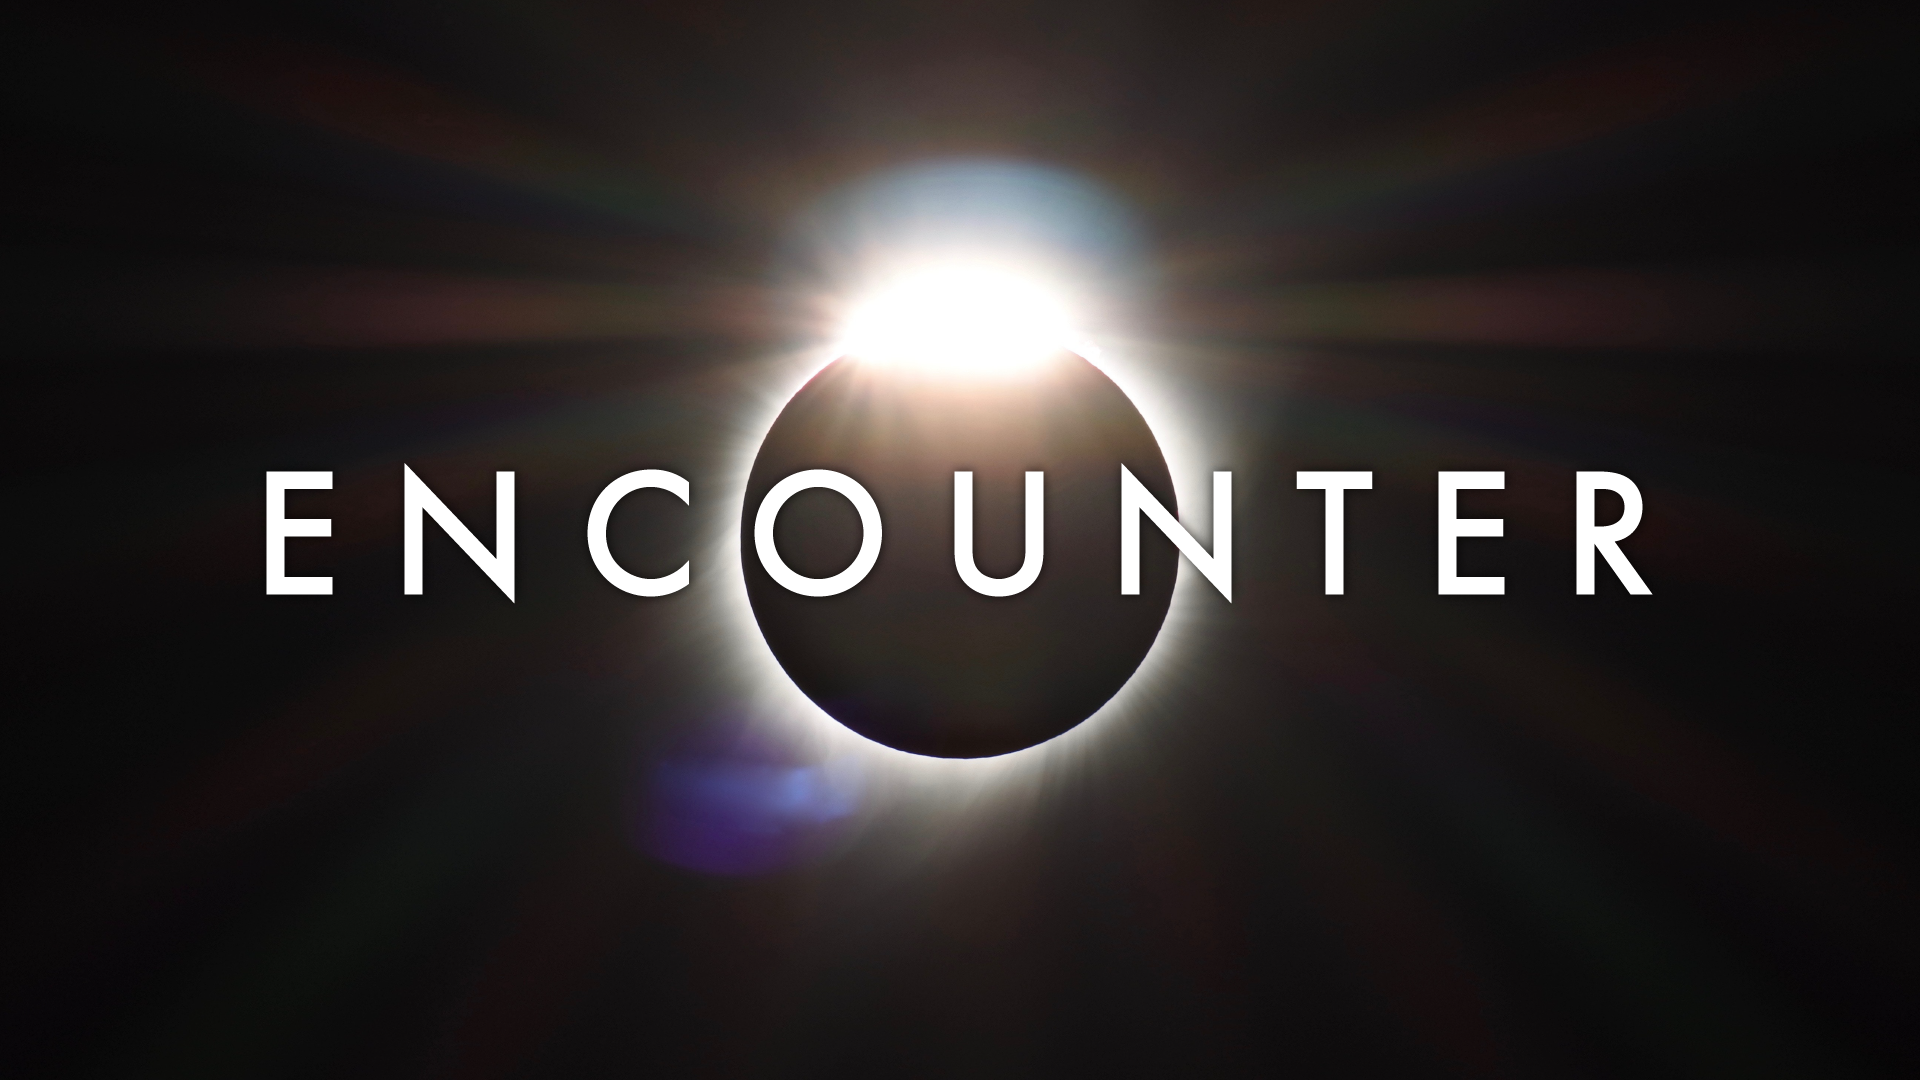 Encounter – Pt. 1 – Paul Maconochie